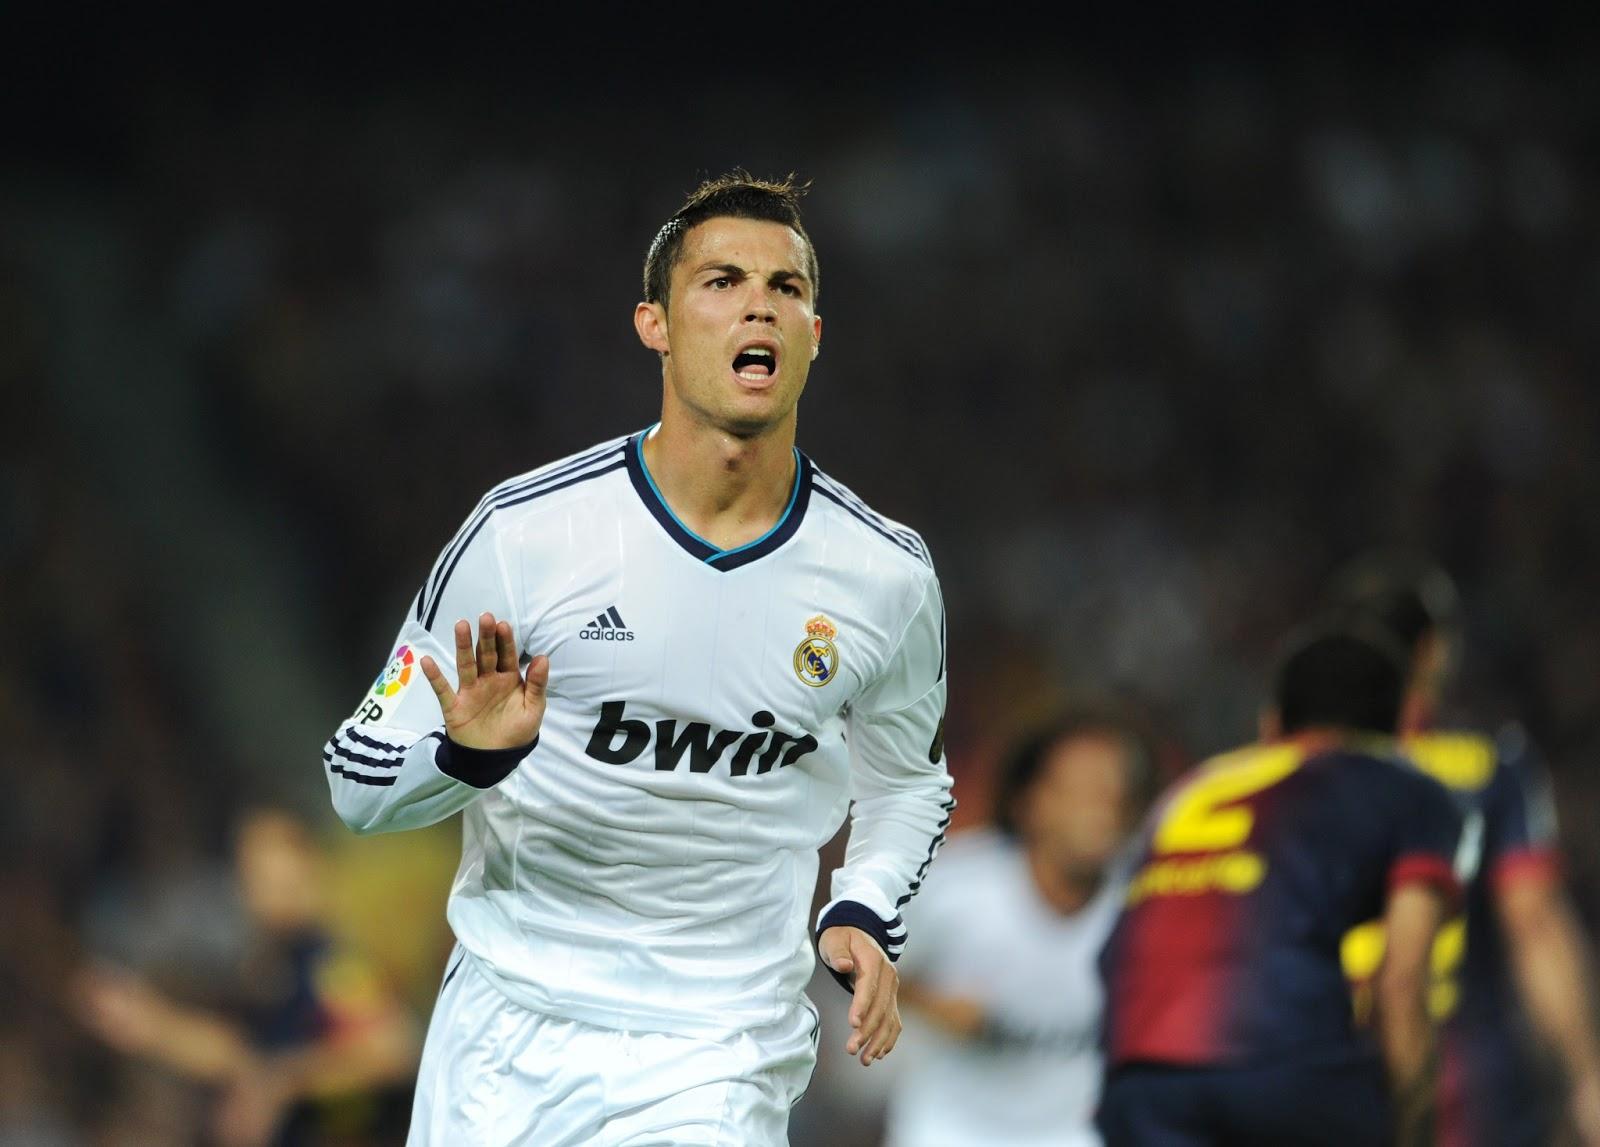 http://1.bp.blogspot.com/-ydzzVqyYBCM/UPnecxU-BYI/AAAAAAAAPIQ/gWIRZ0U5--Q/s1600/Cristiano-Ronaldo-2013-HD-Wallpaper-Picture-Real-Madrid-Calma-Calma.jpg